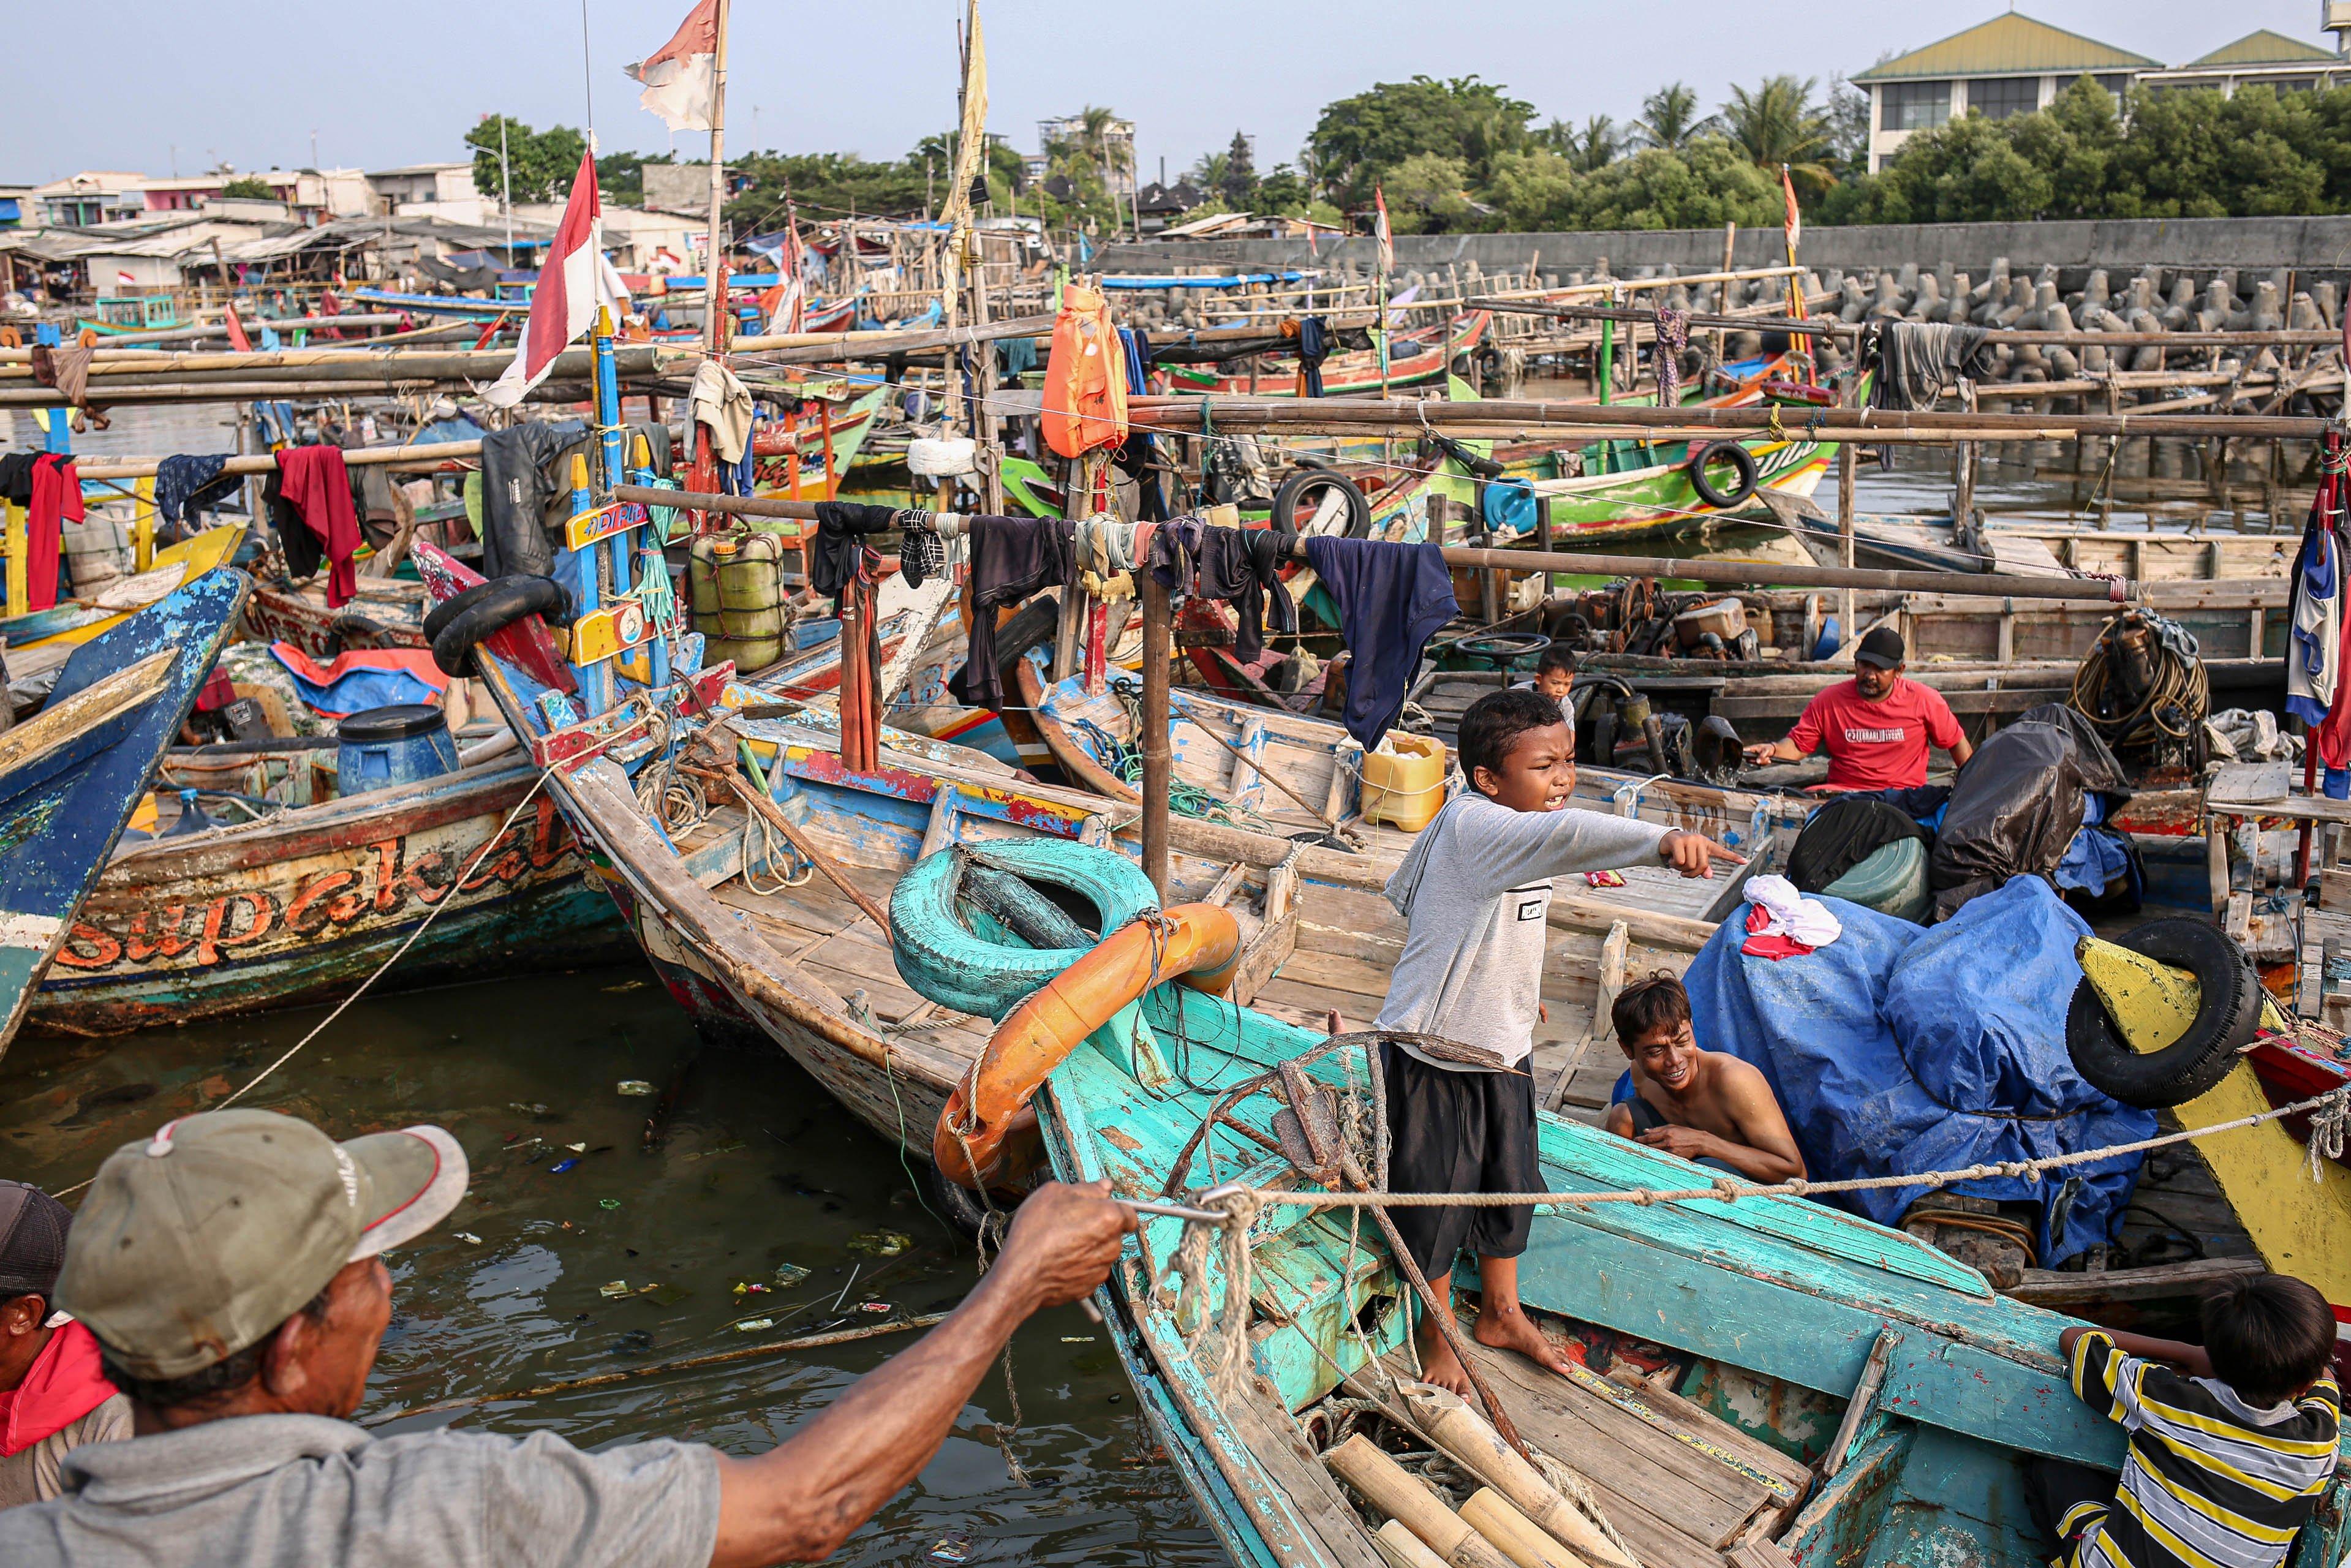 Sejumlah warga menaiki perahu di Kampung Nelayan, Jakarta Utara, Minggu (9/8/2020). Kesatuan Nelayan Tradisional Indonesia (KNTI) mengklaim penurunan penjualan tangkapan nelayan mencapai 21 persen dan pendapatan hingga 90 persen akibat merebaknya virus covid-19.